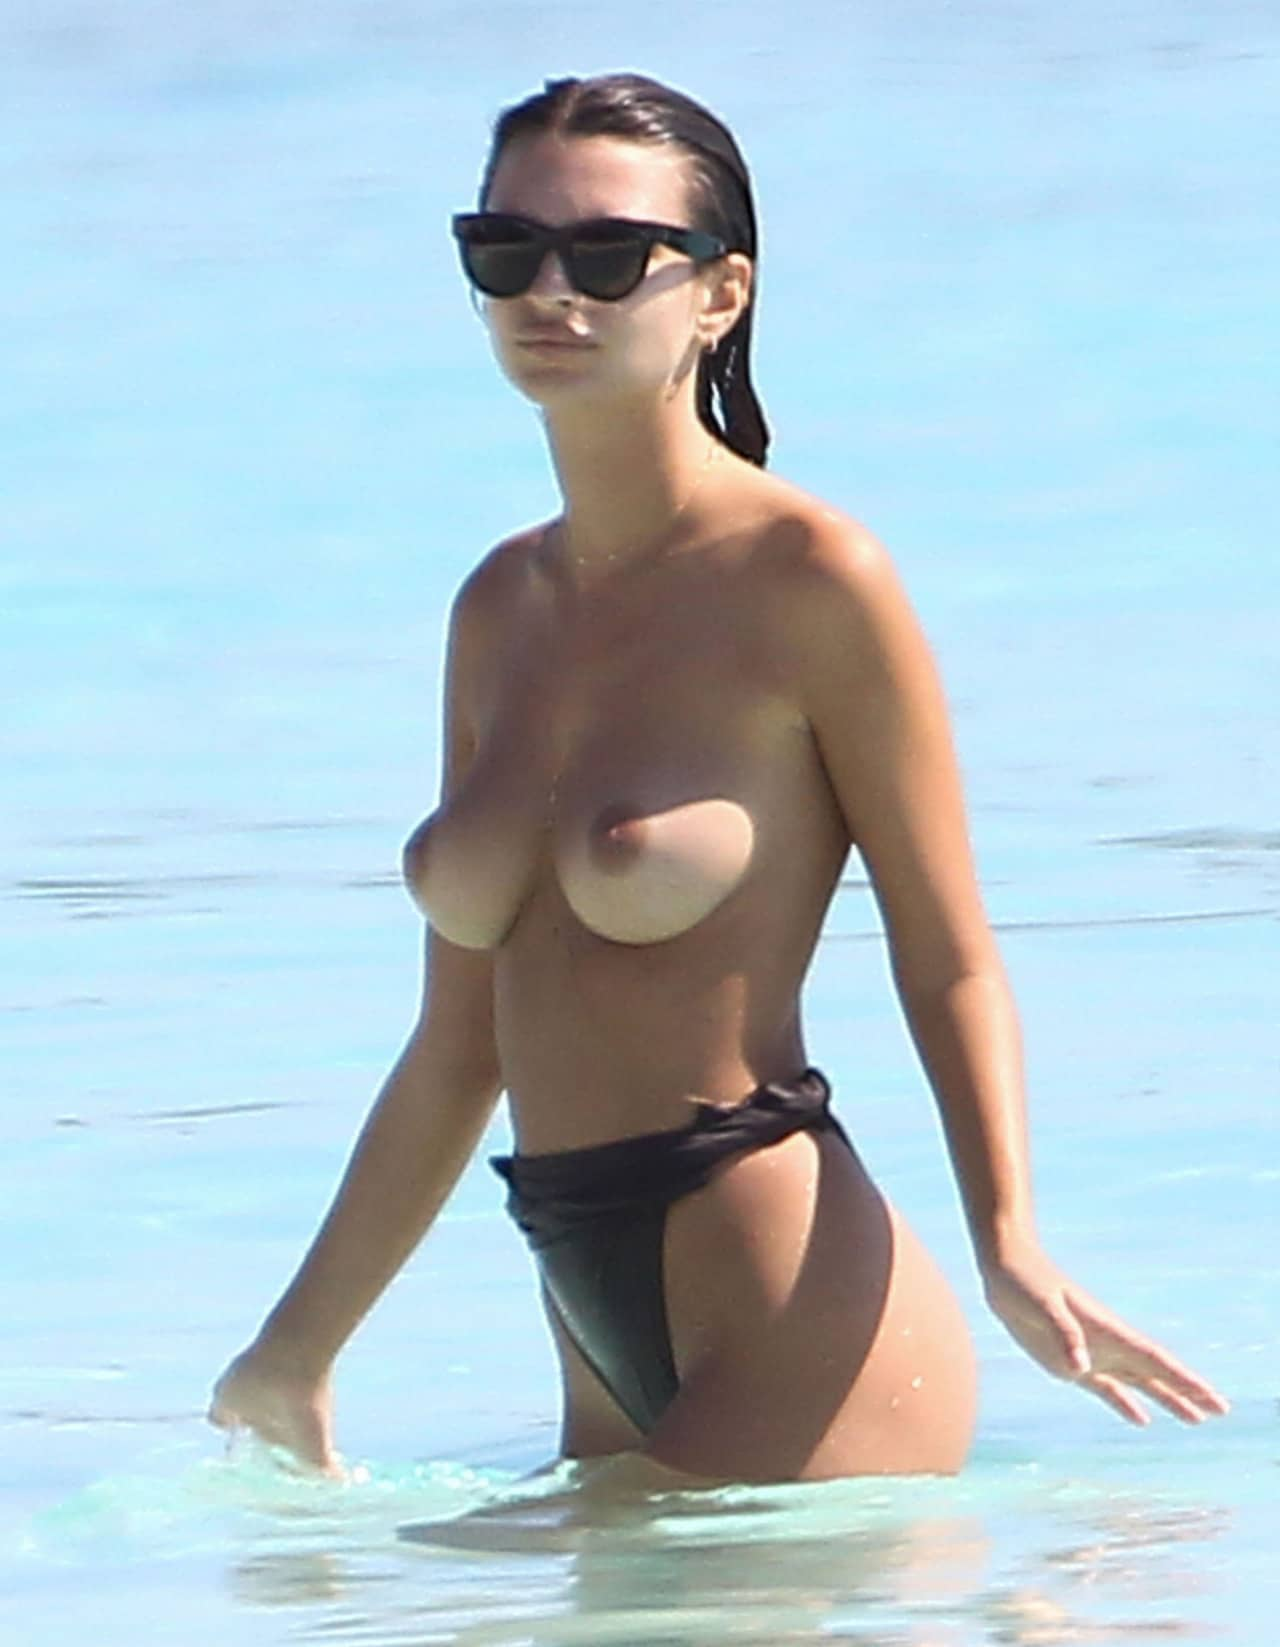 model emily ratajkowski topless ocean pic